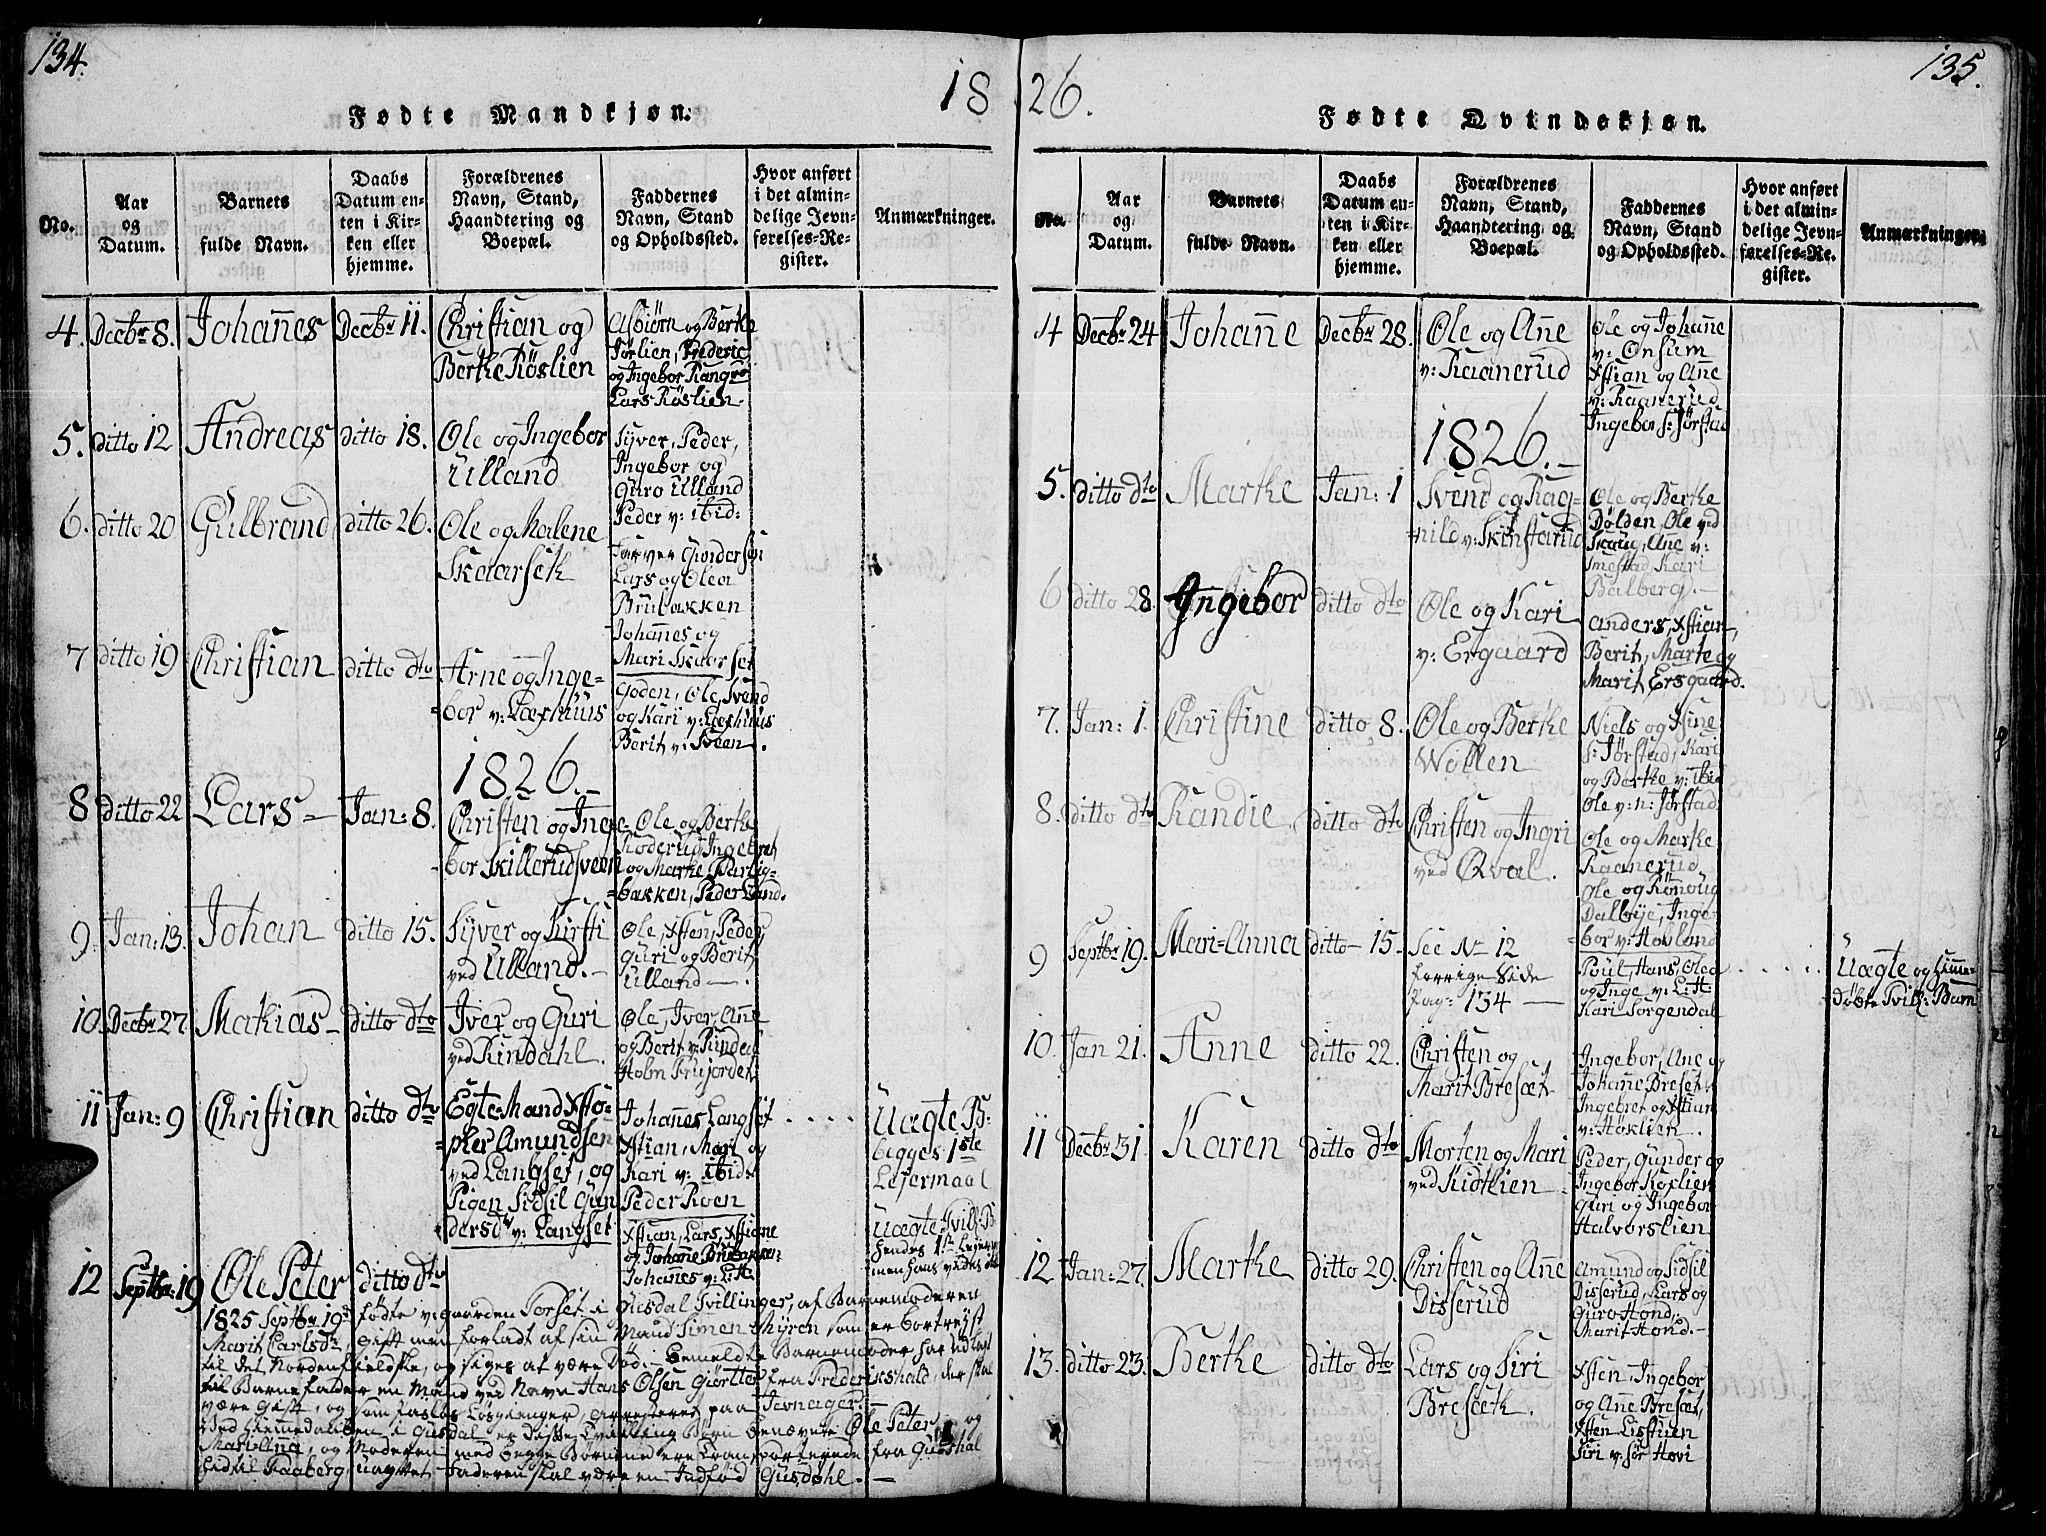 SAH, Fåberg prestekontor, Klokkerbok nr. 4, 1818-1837, s. 134-135